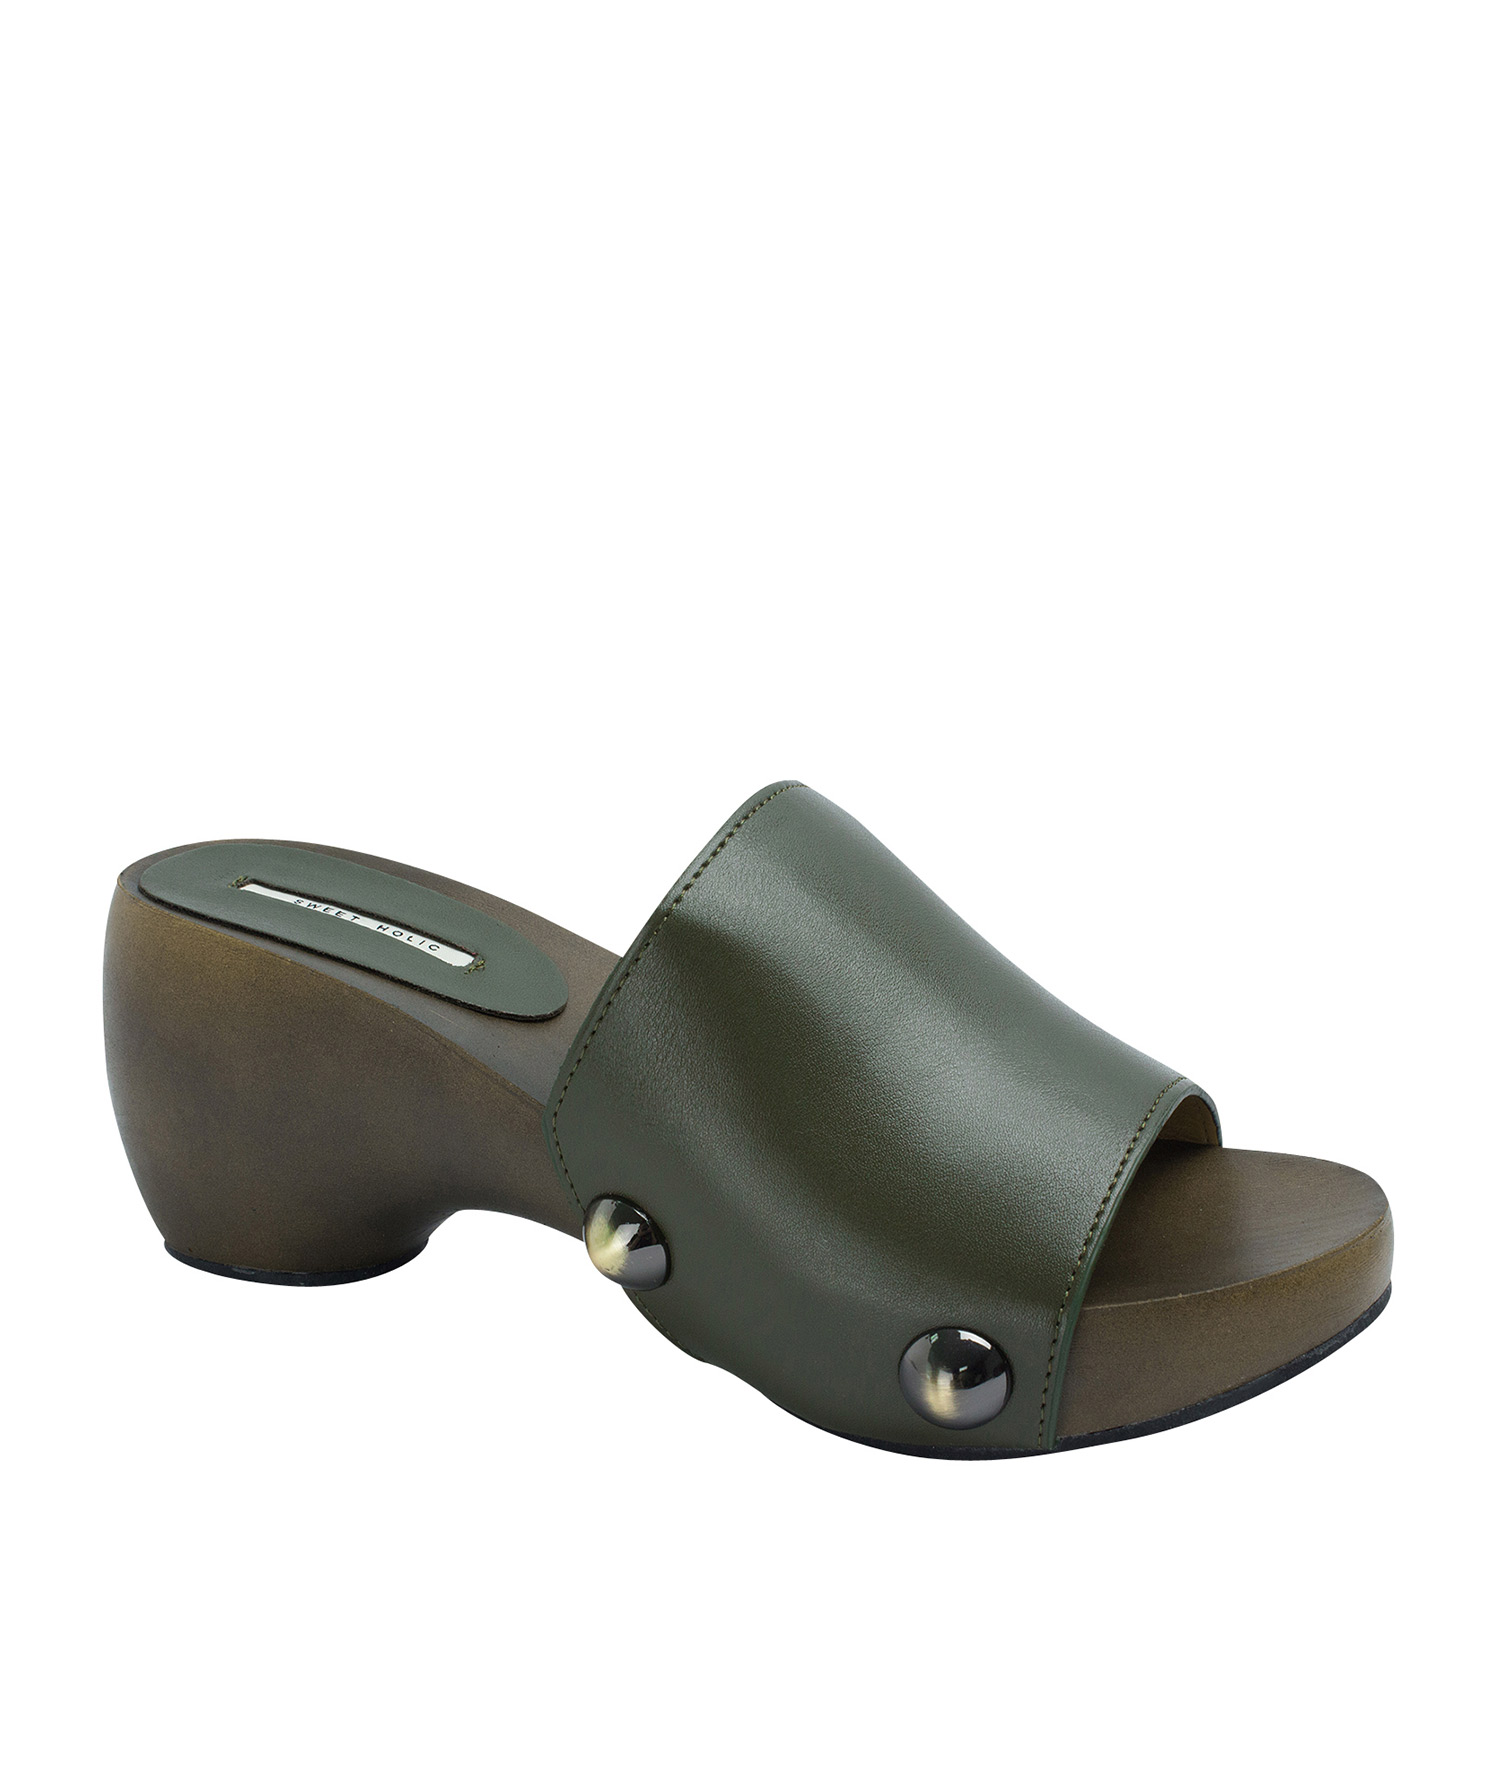 6c6bfcc9021 AnnaKastle Womens Bold Studded Platform Clog Sandals Army Green